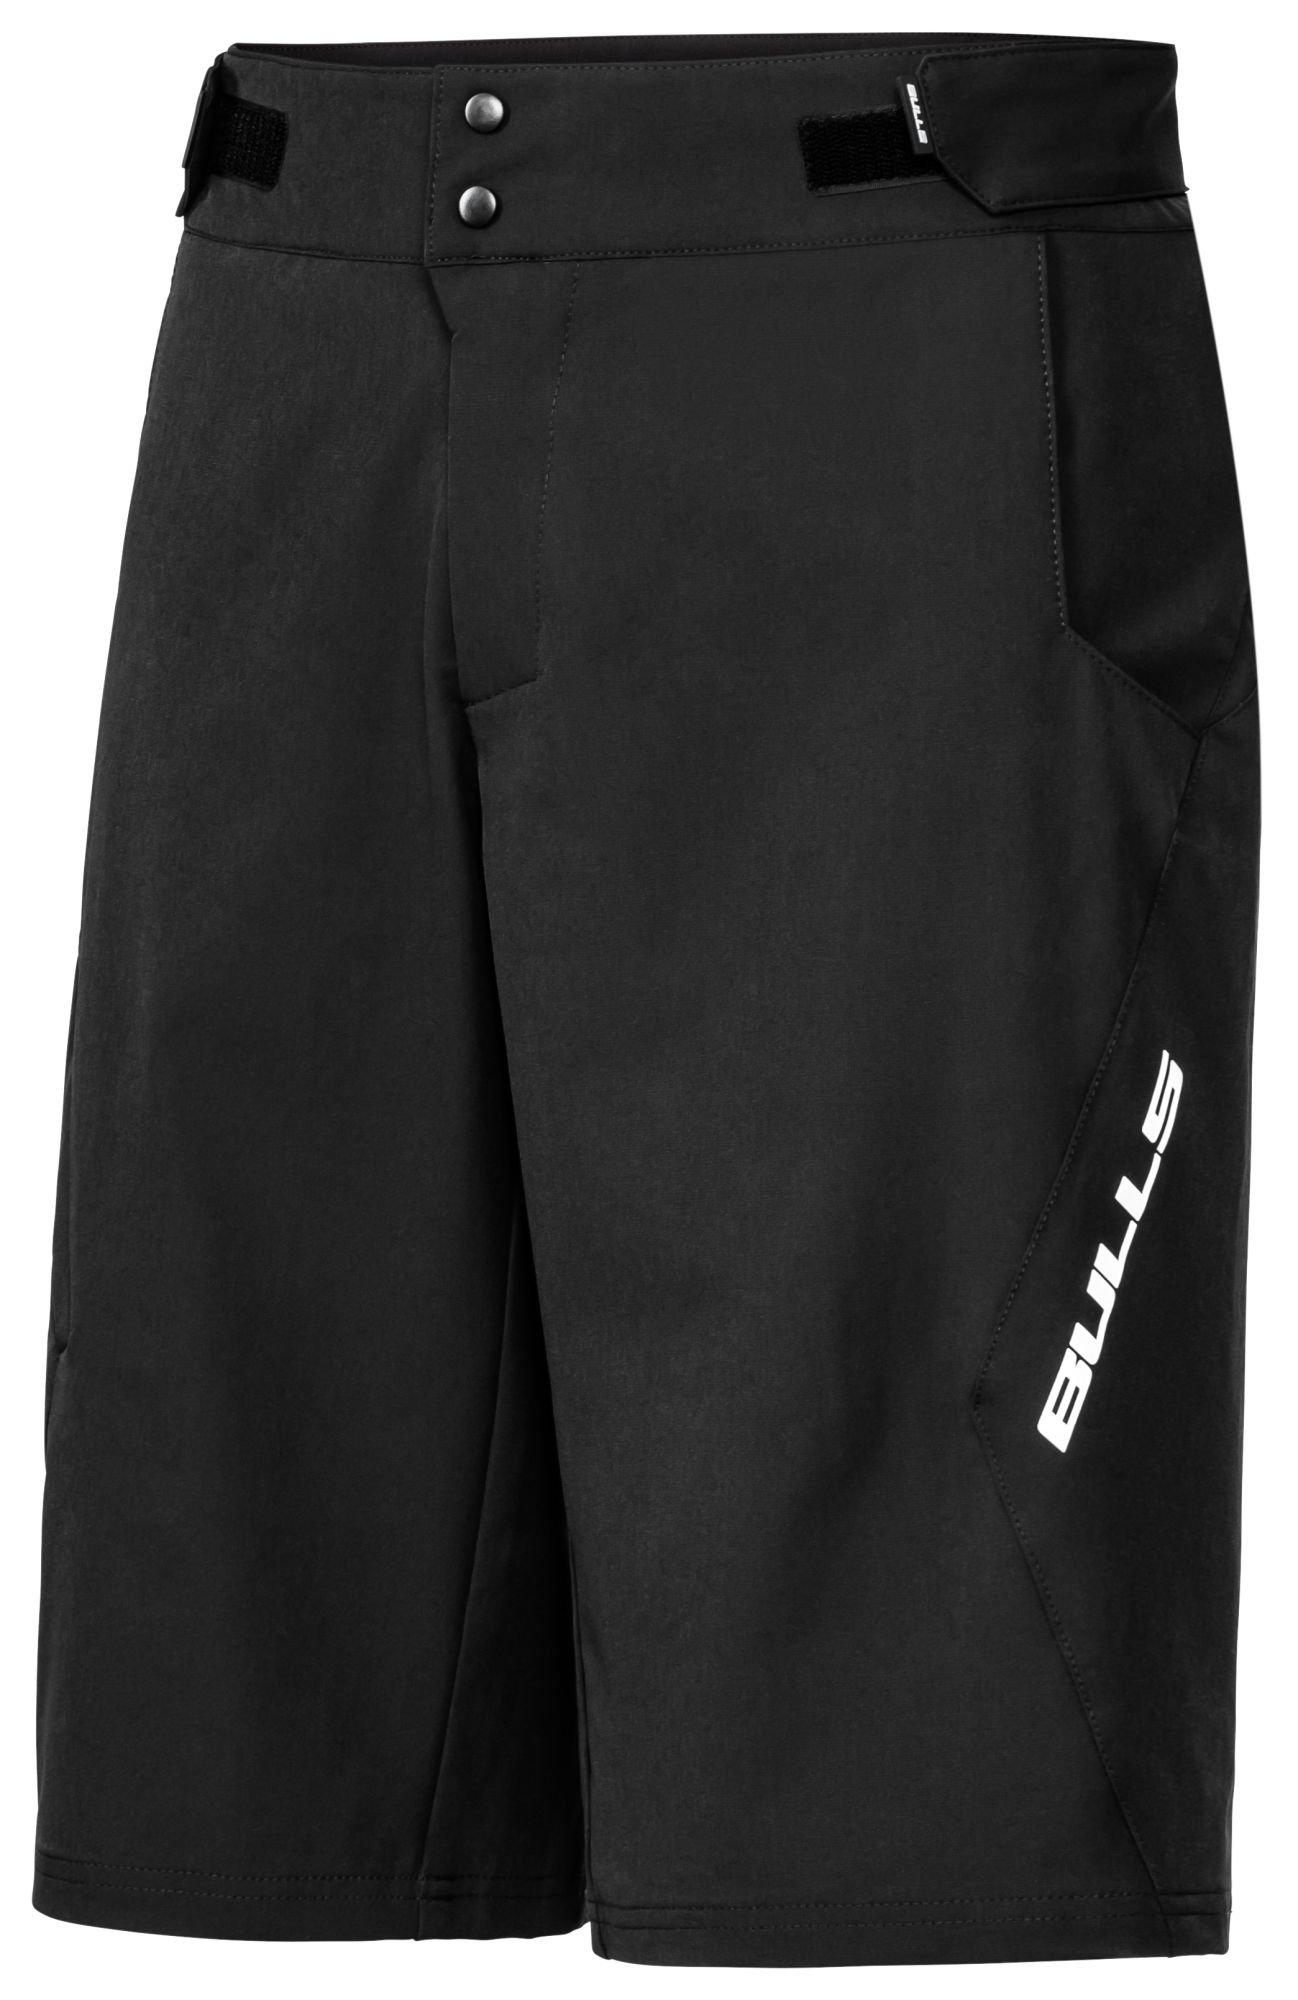 bikeshorts/Hosen: Bulls BULLS Mountainbikeshorts Lux 2.0 XXL